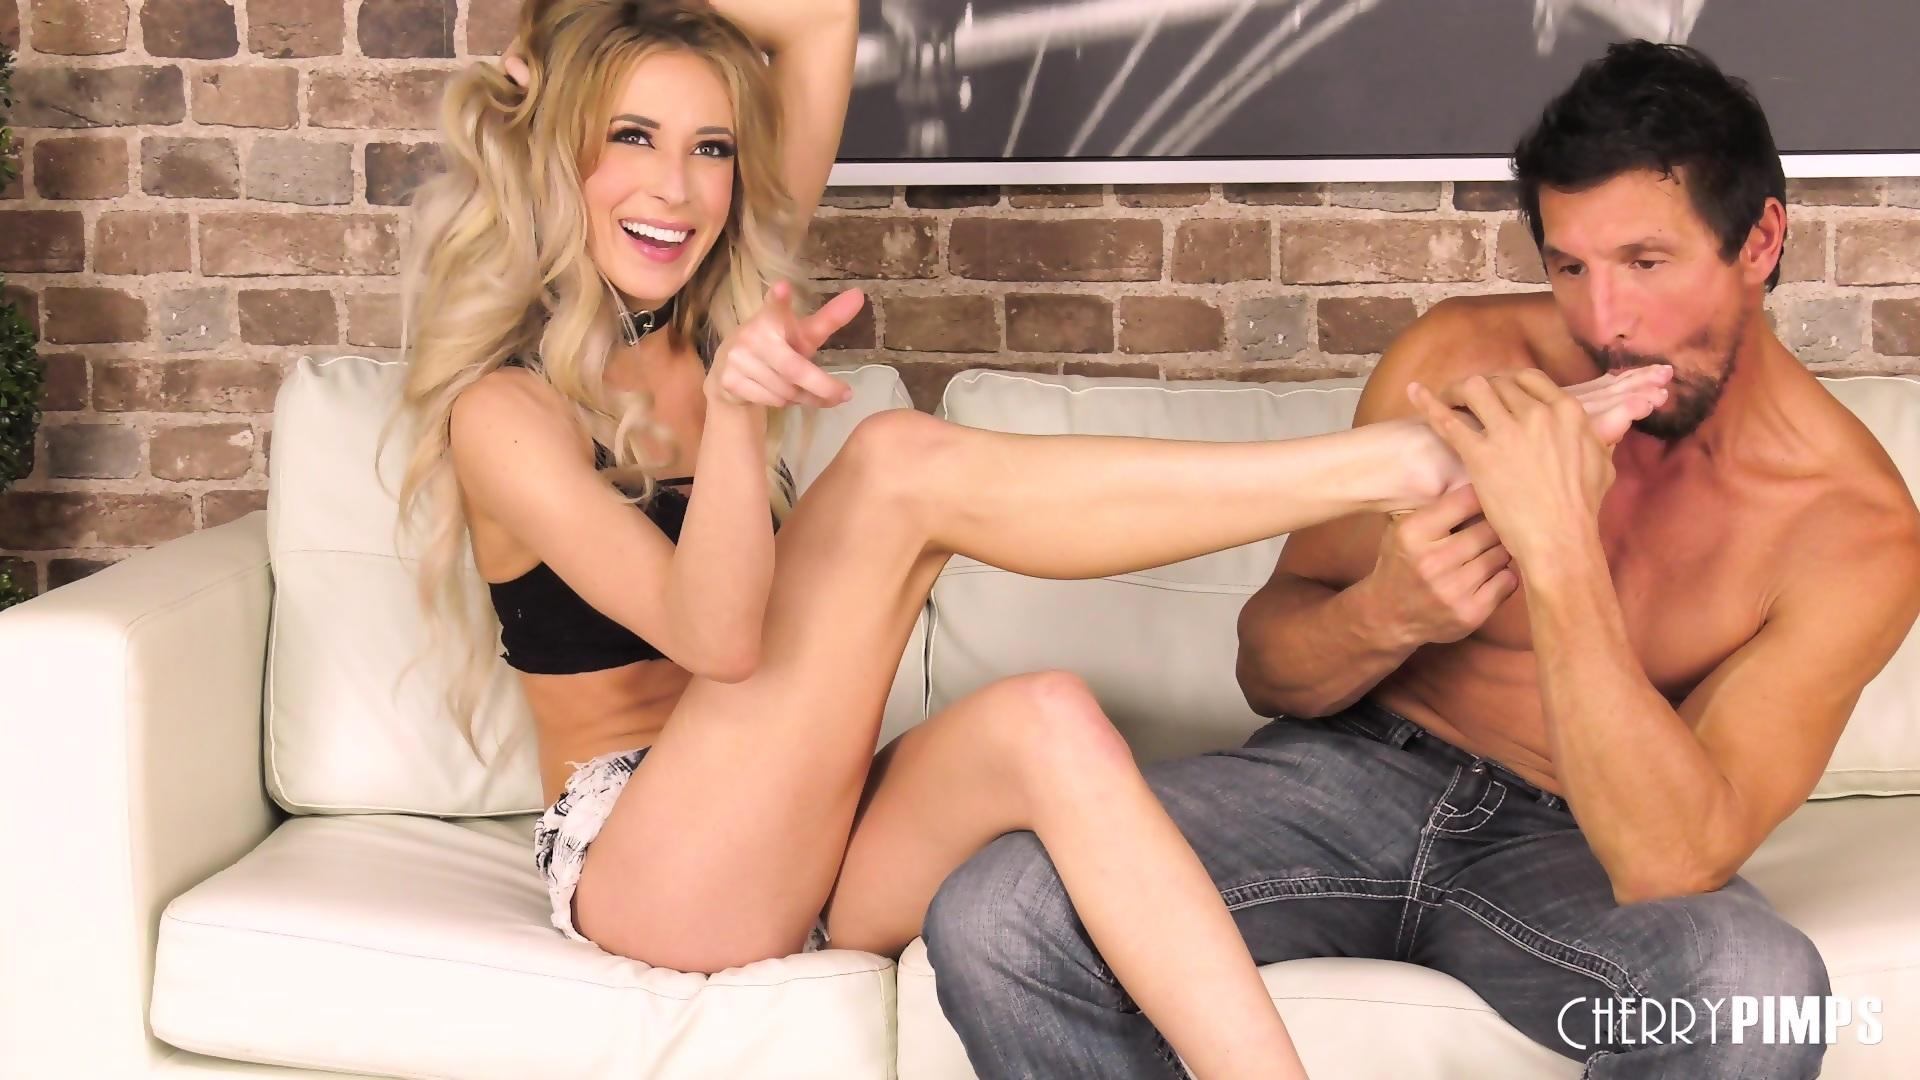 Aiden Ashley Porn aiden ashley loves riding hard cock - eporner